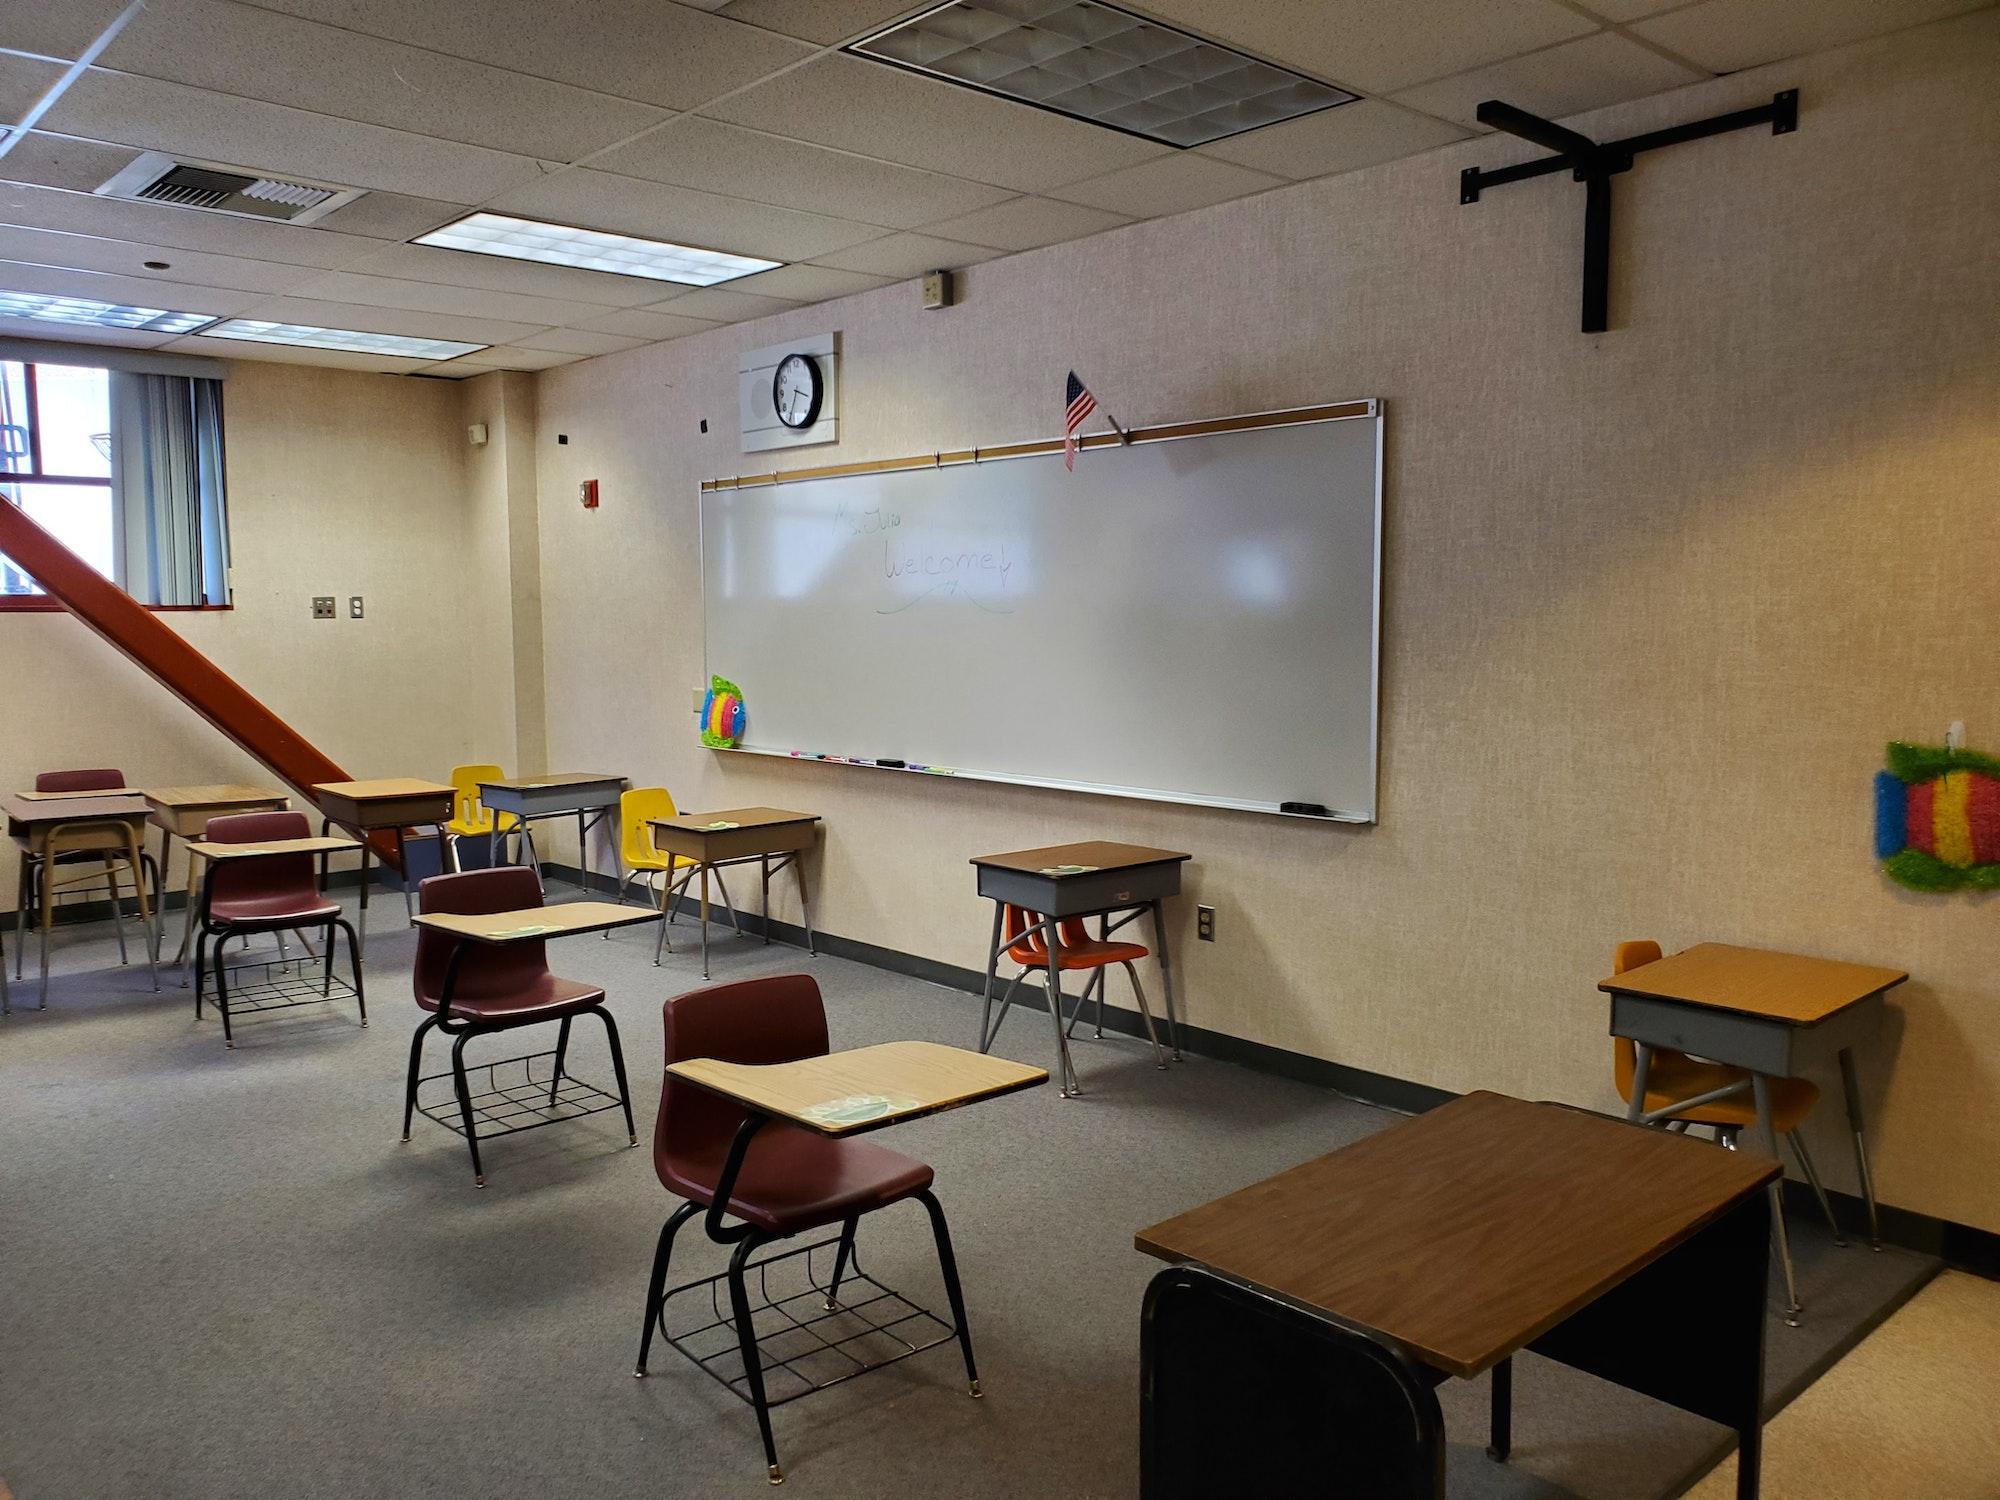 Enrichment Center Class Room at LGECC